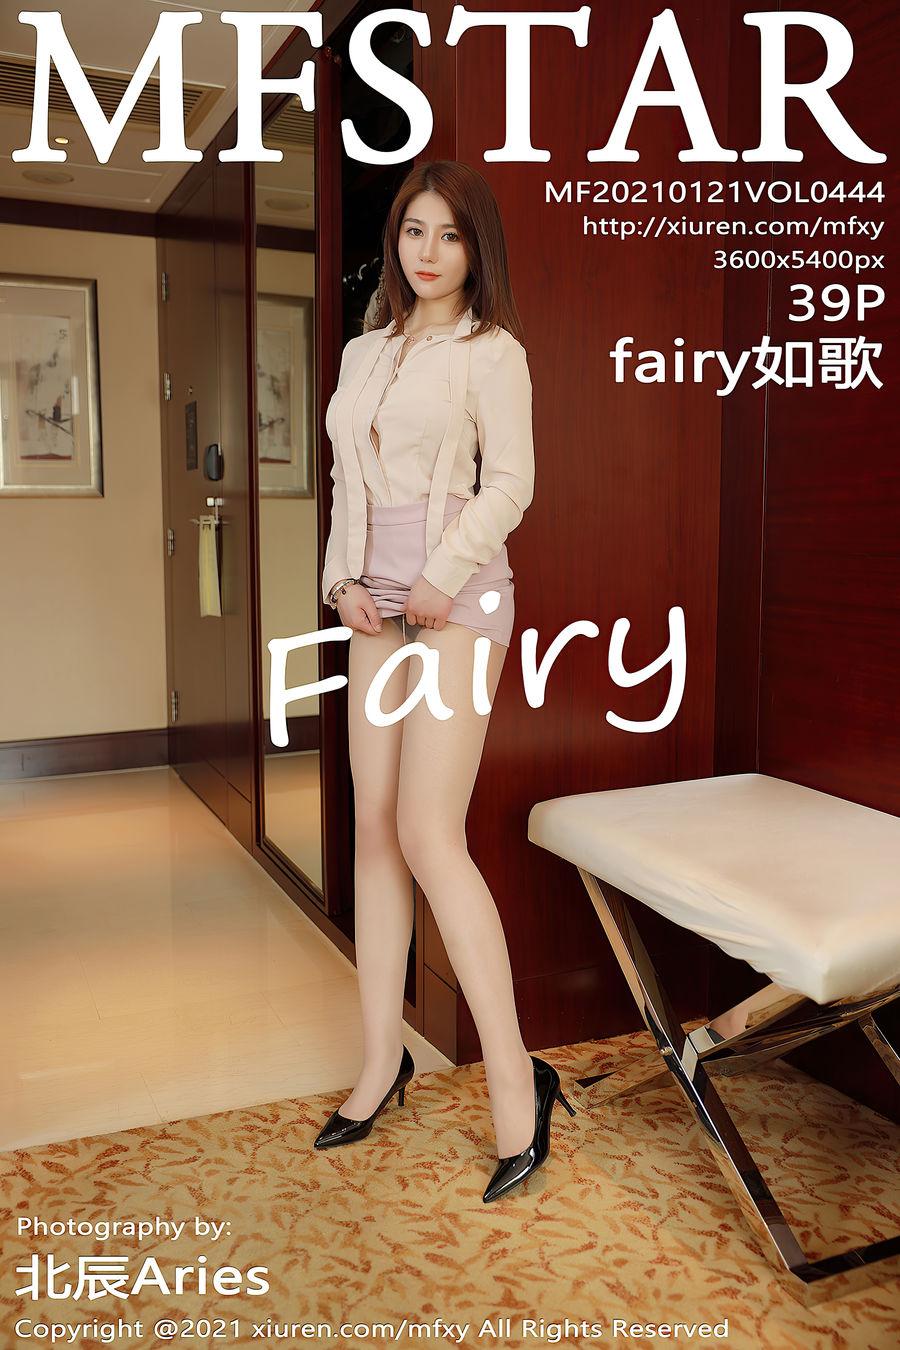 [MFStar模范学院] VOL.444 fairy如歌 [39+1P/465M]